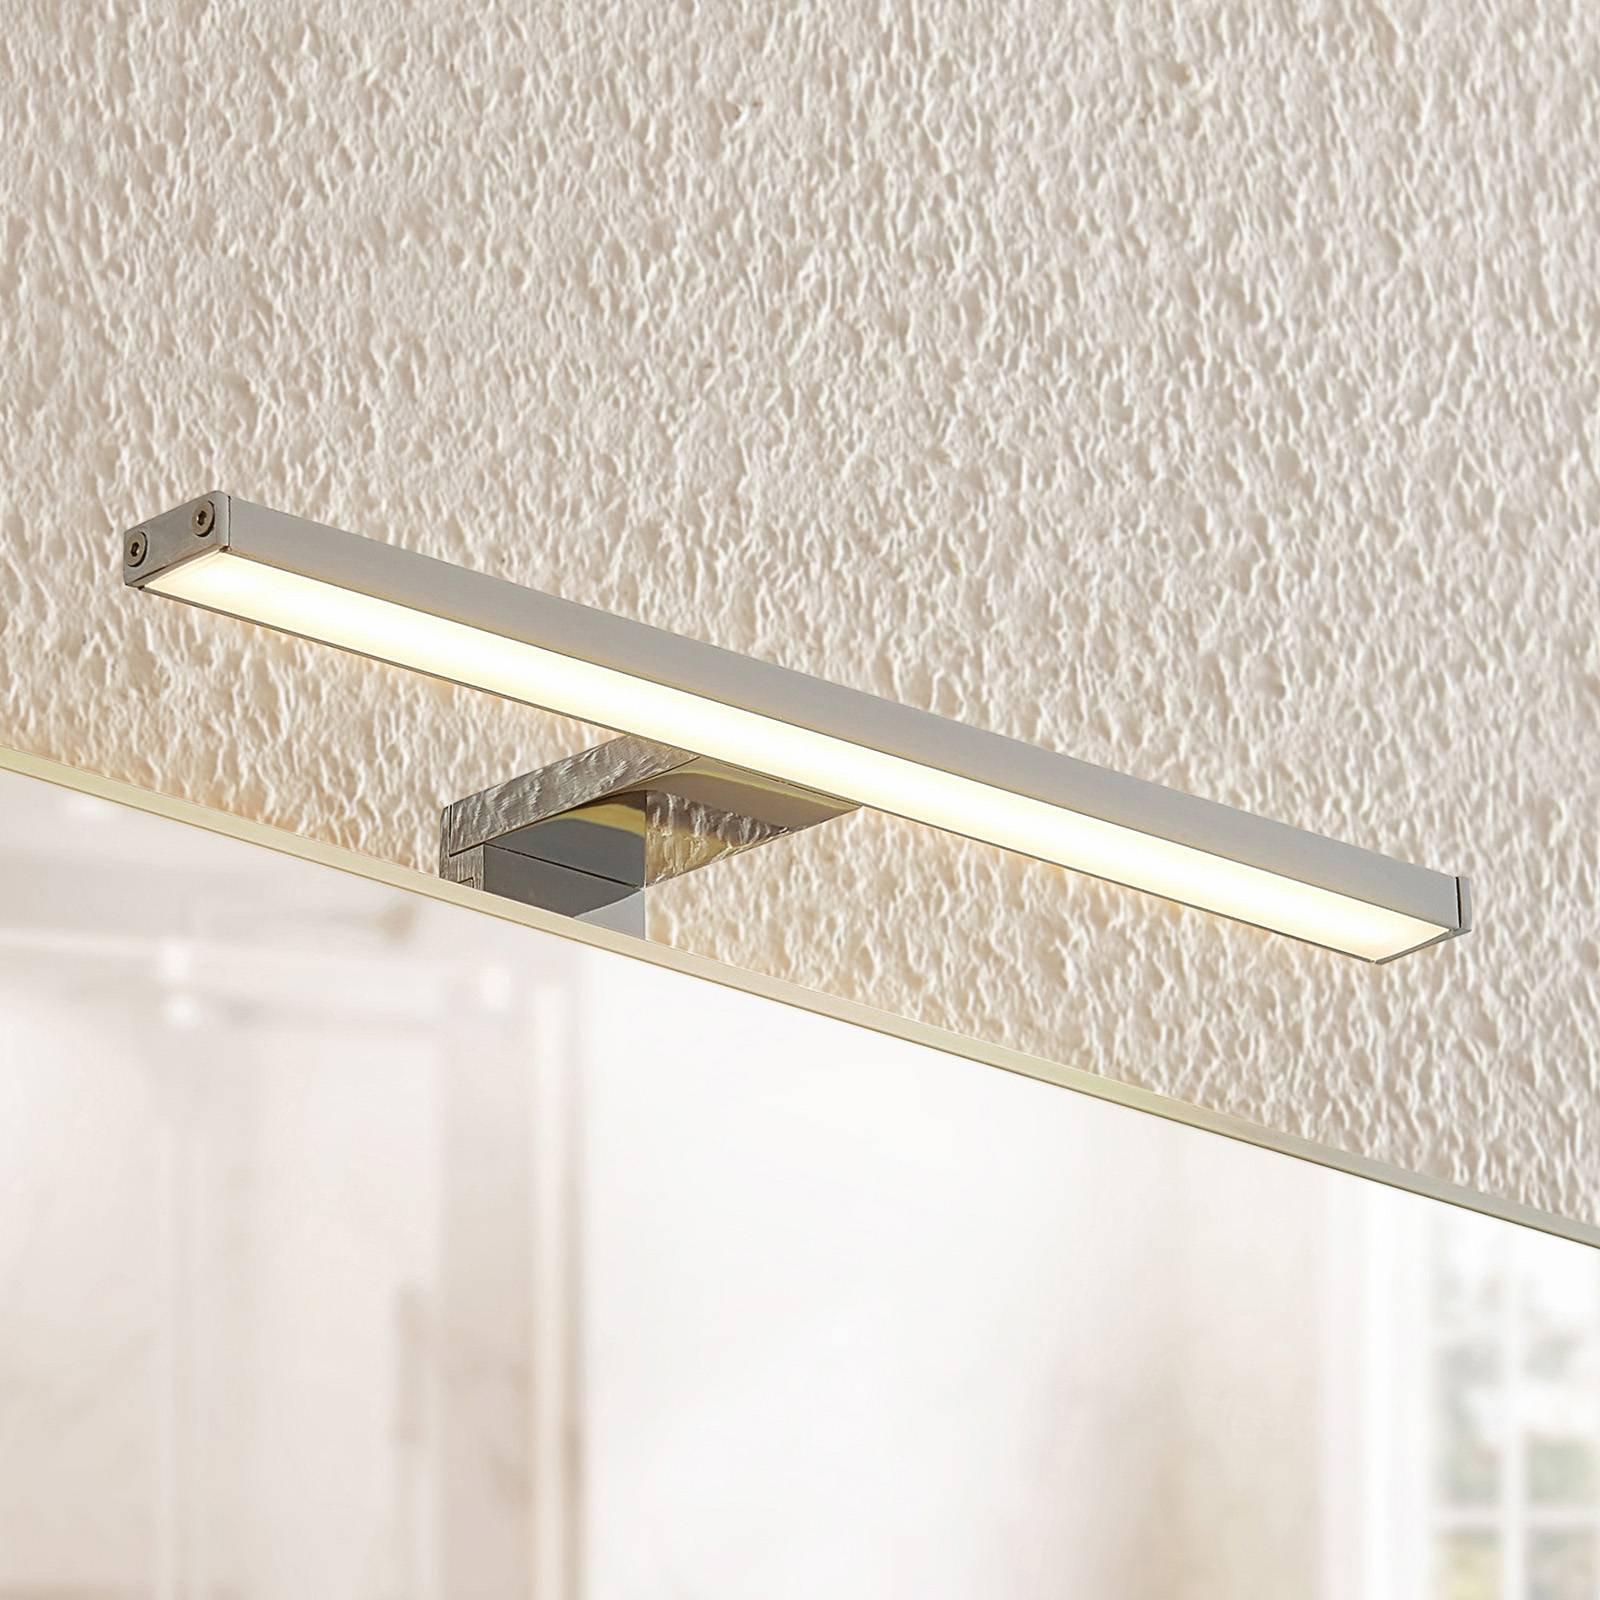 Lindby Daitani LED-speillampe for bad, 30,5 cm